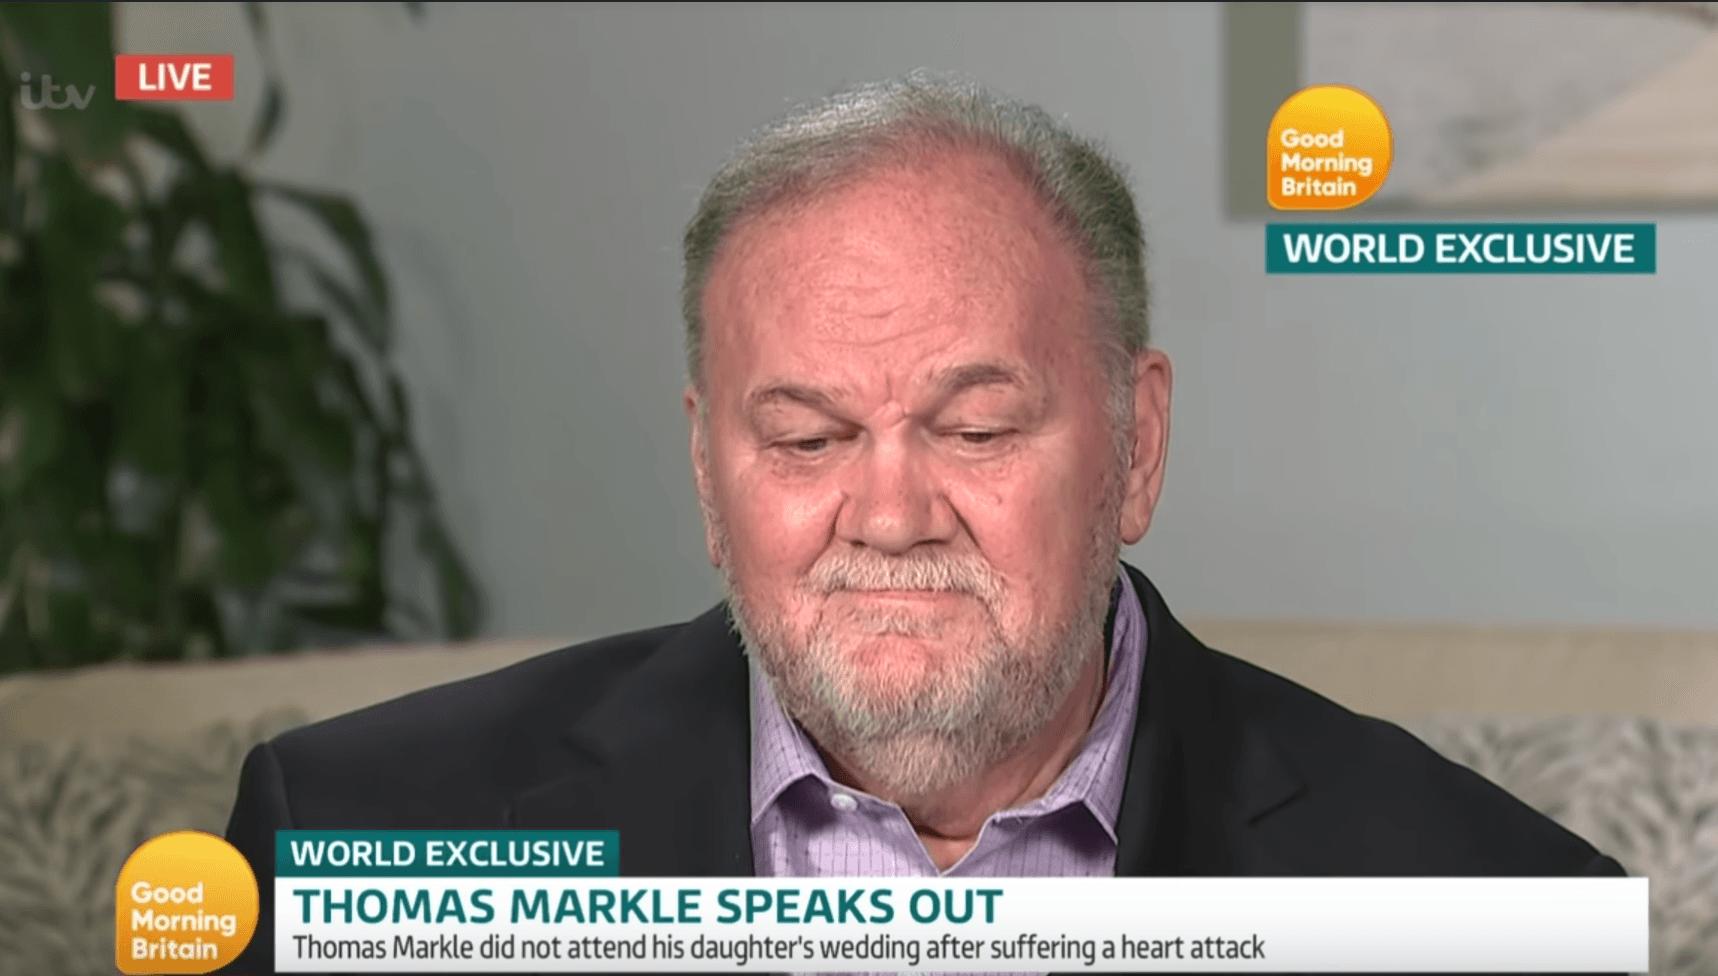 Thomas Markle on 'Good Morning Britain'